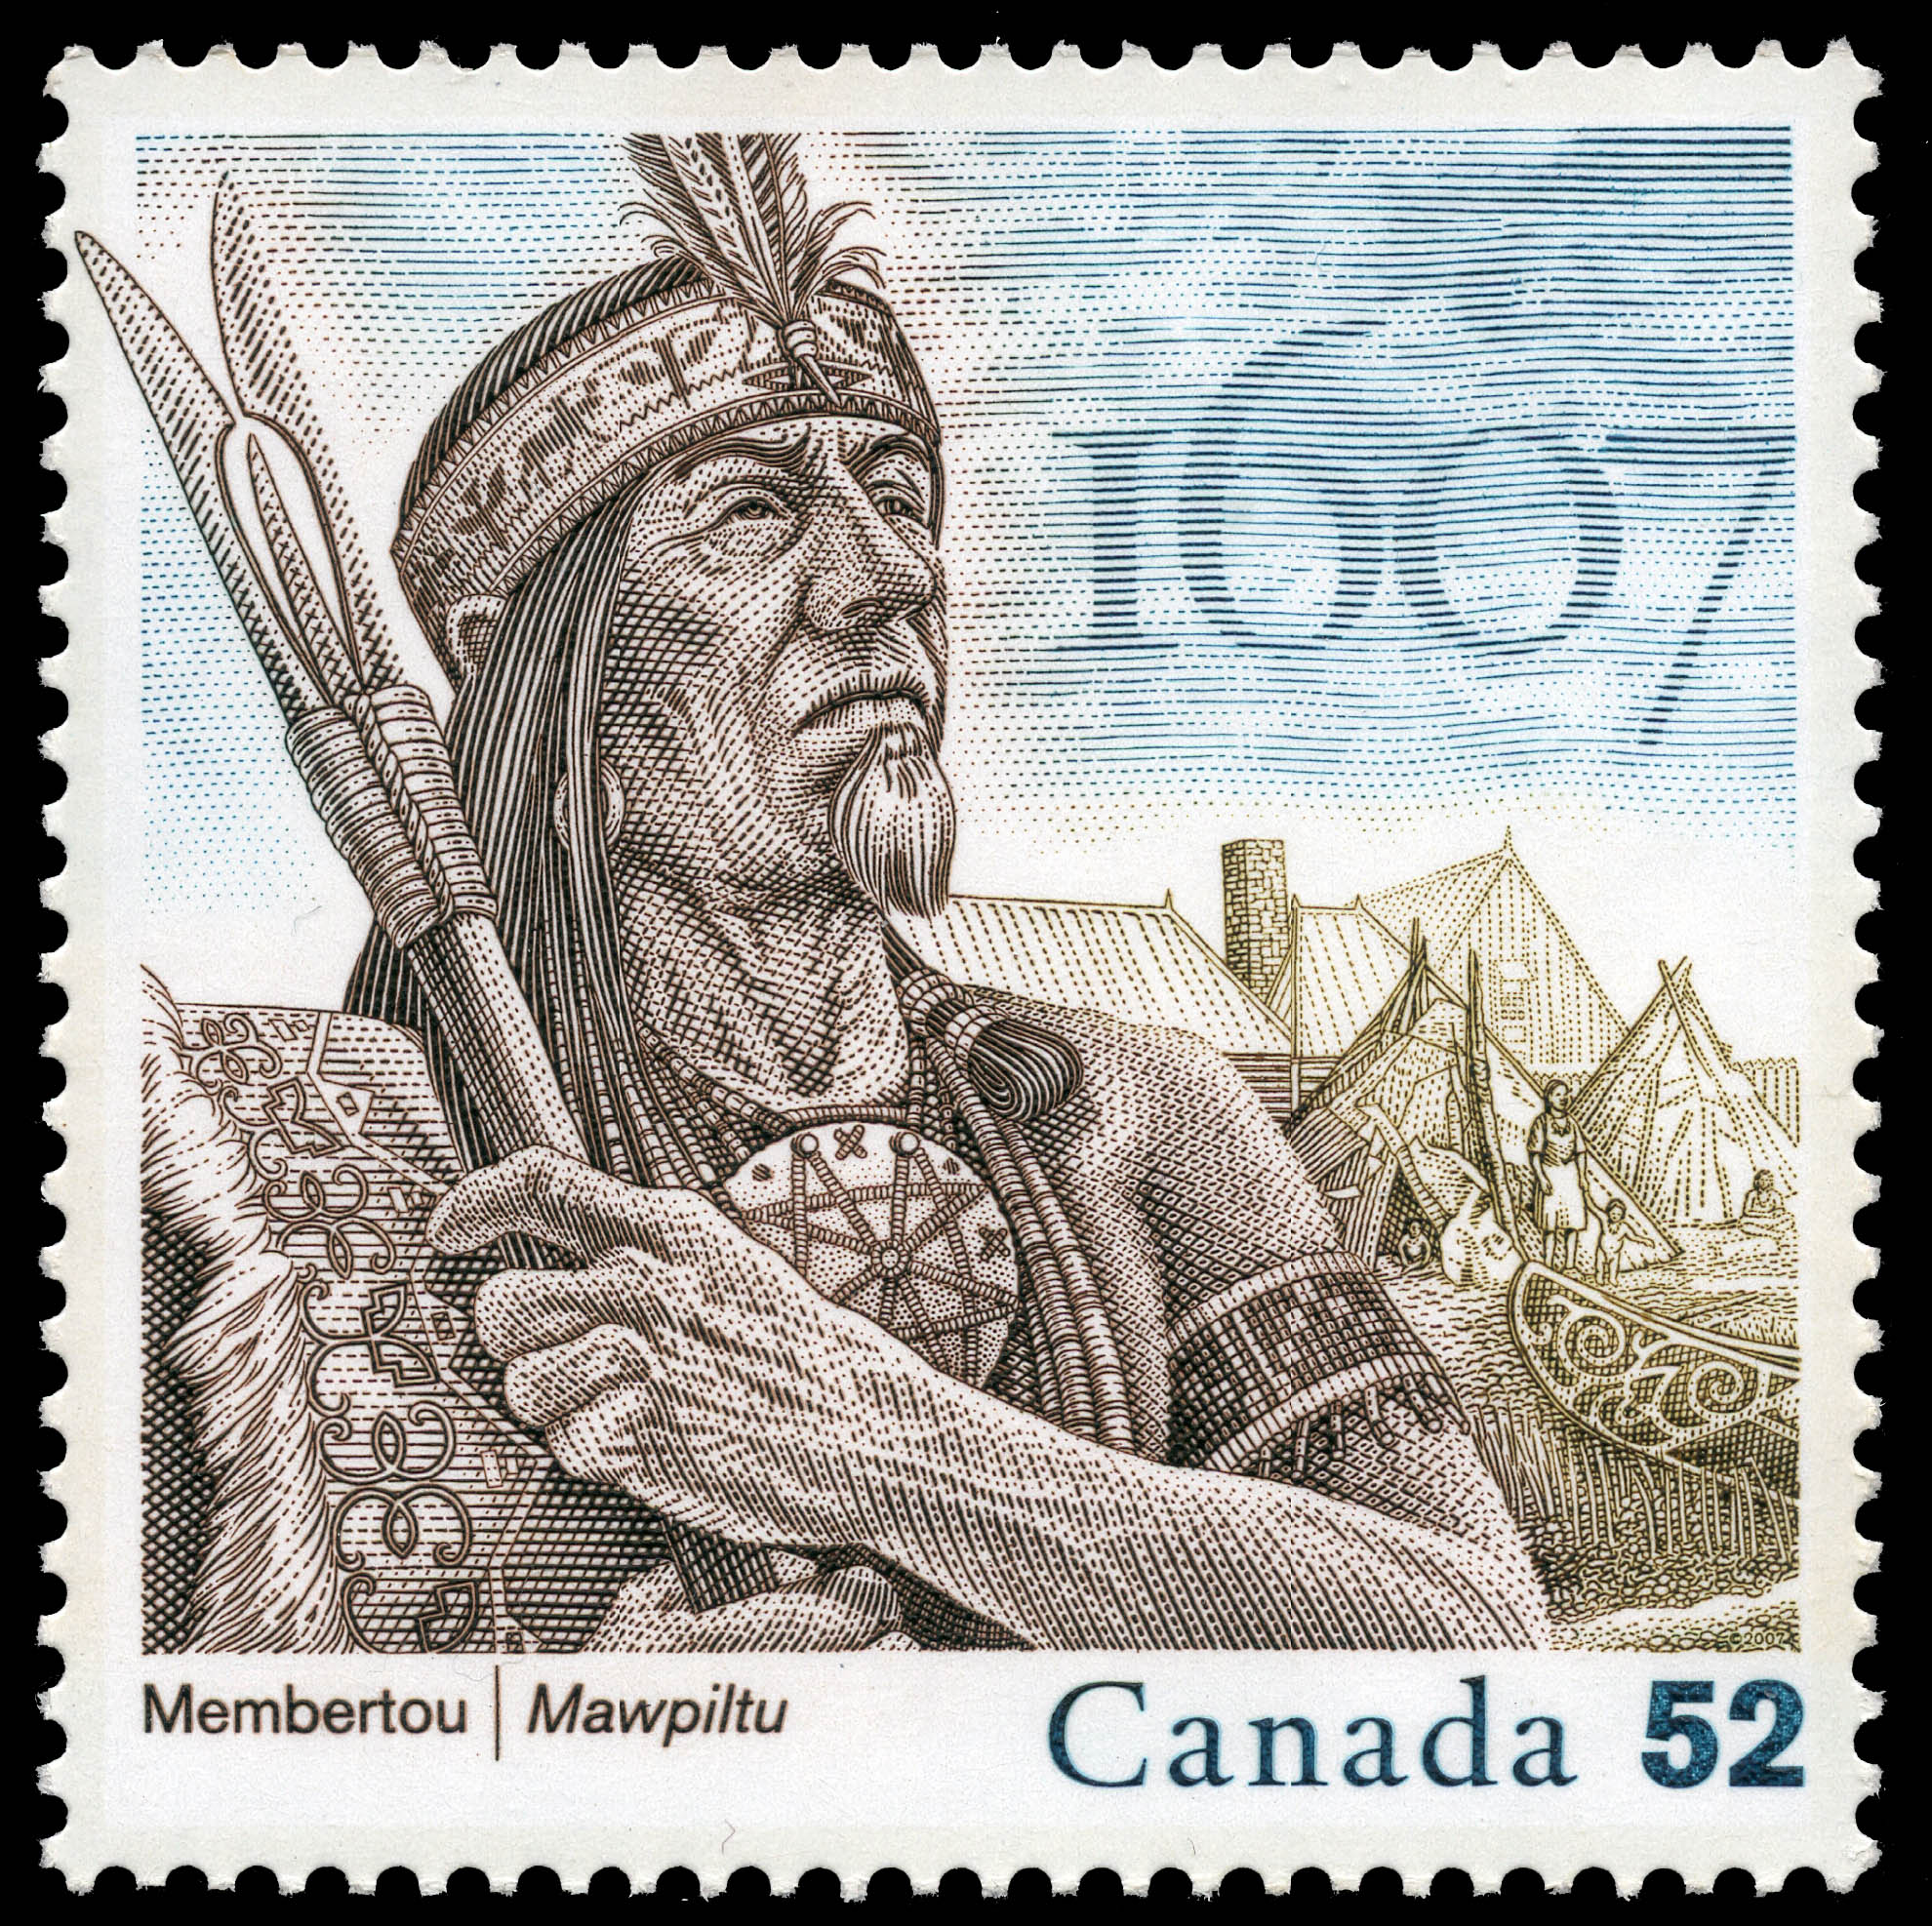 Membertou - 1607 Canada Postage Stamp